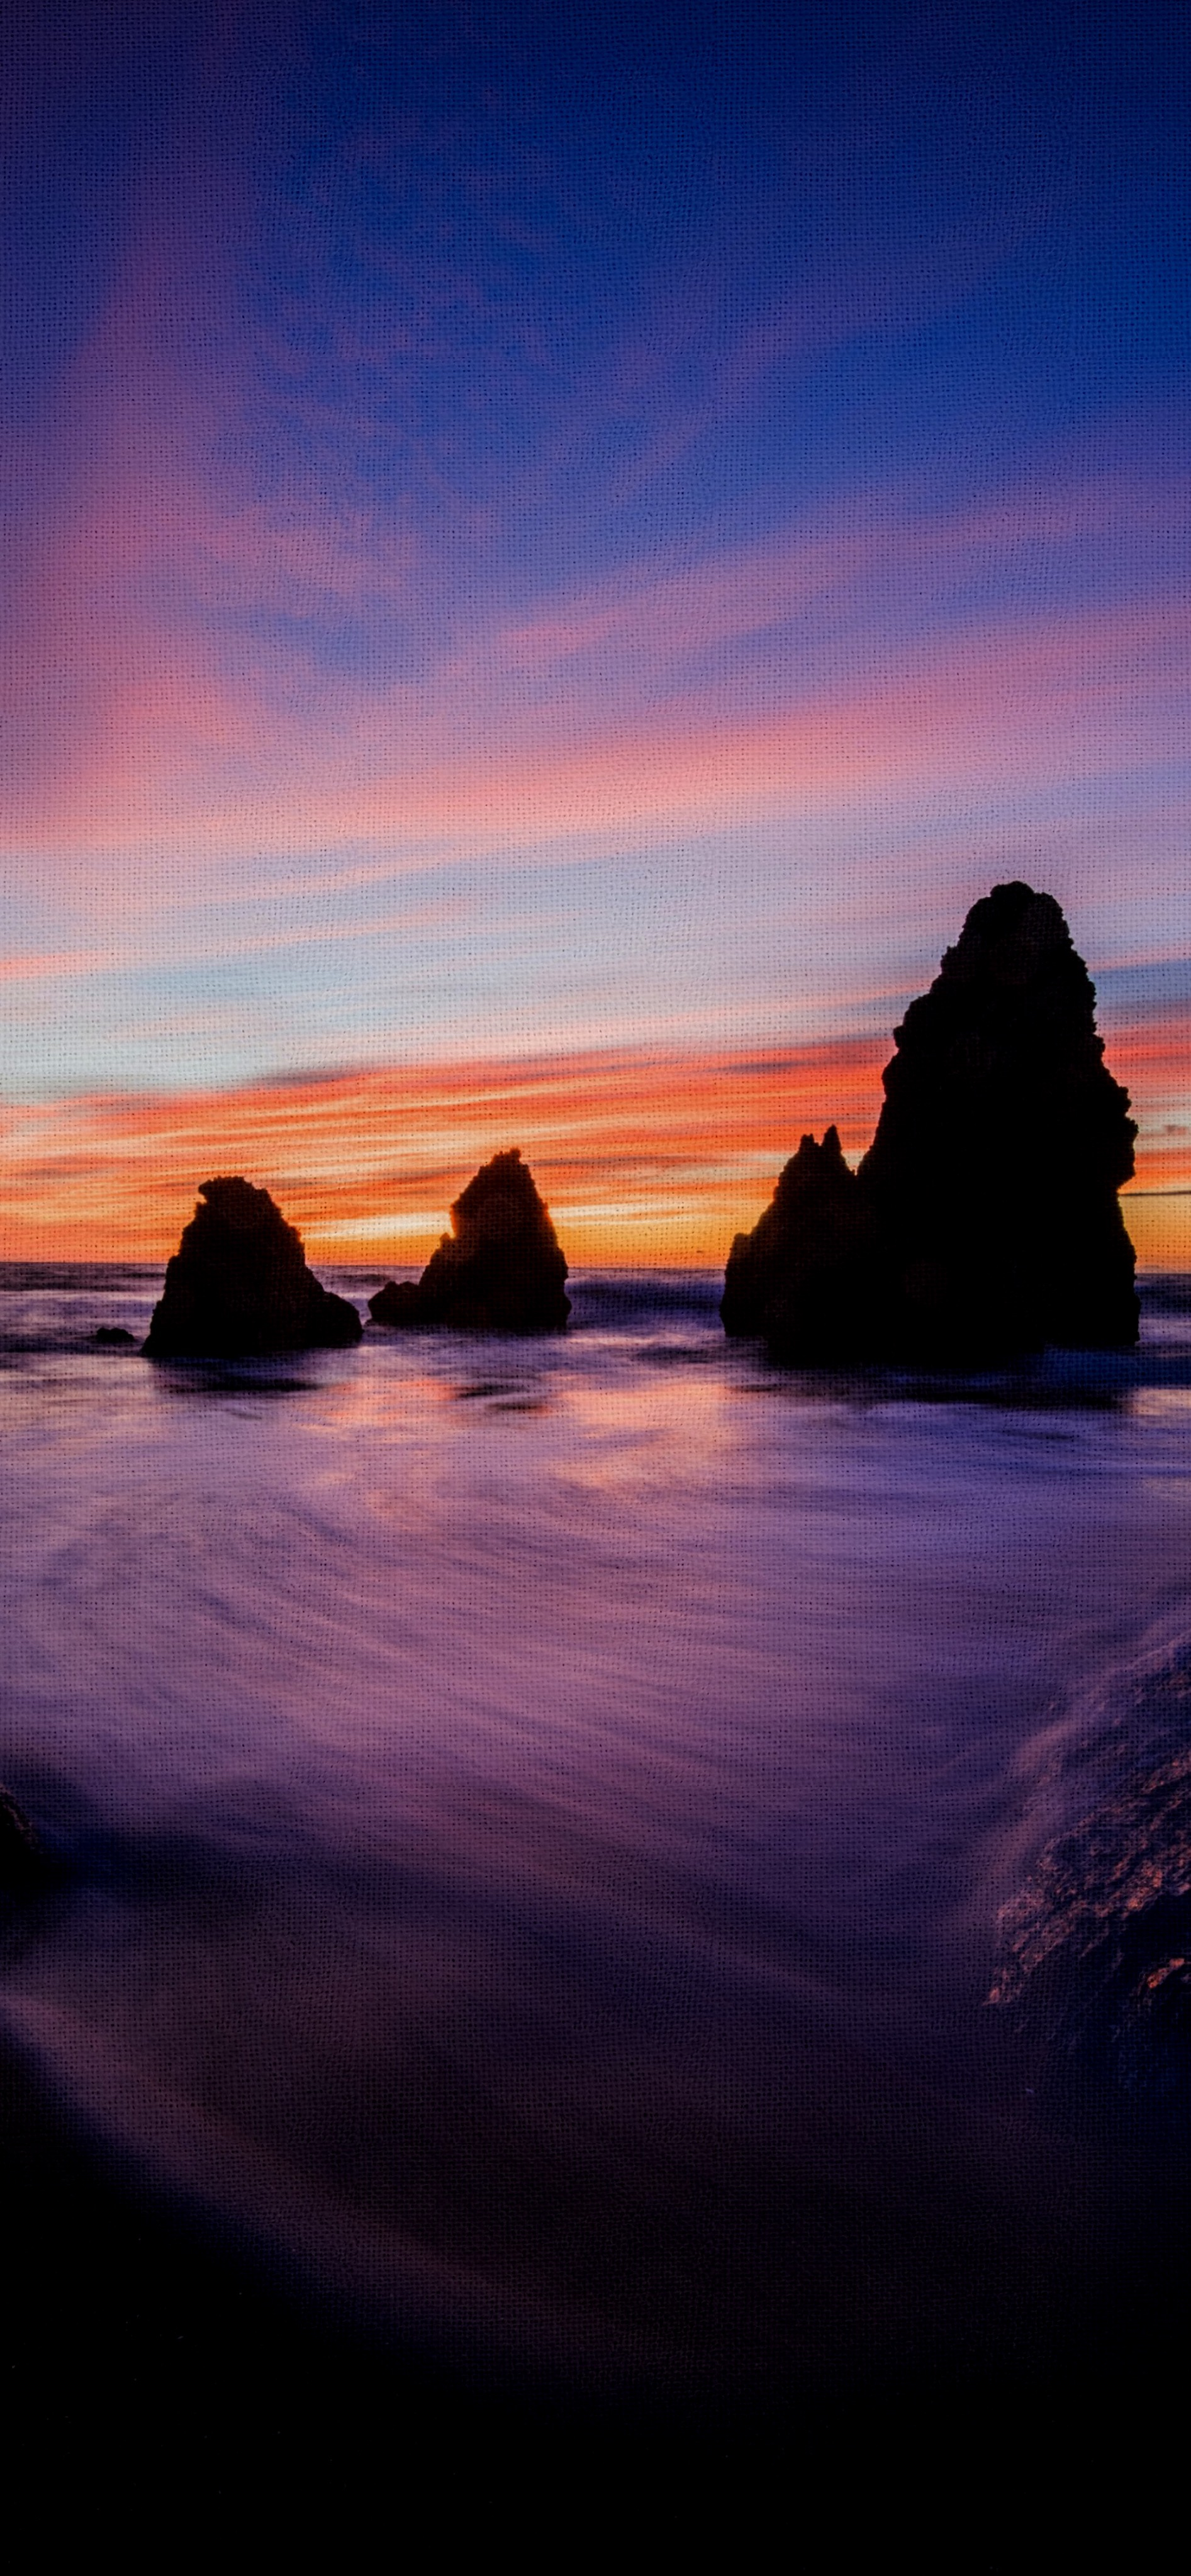 canvas vector iphone wallpaper jianoliu idownloadblog sea rocks